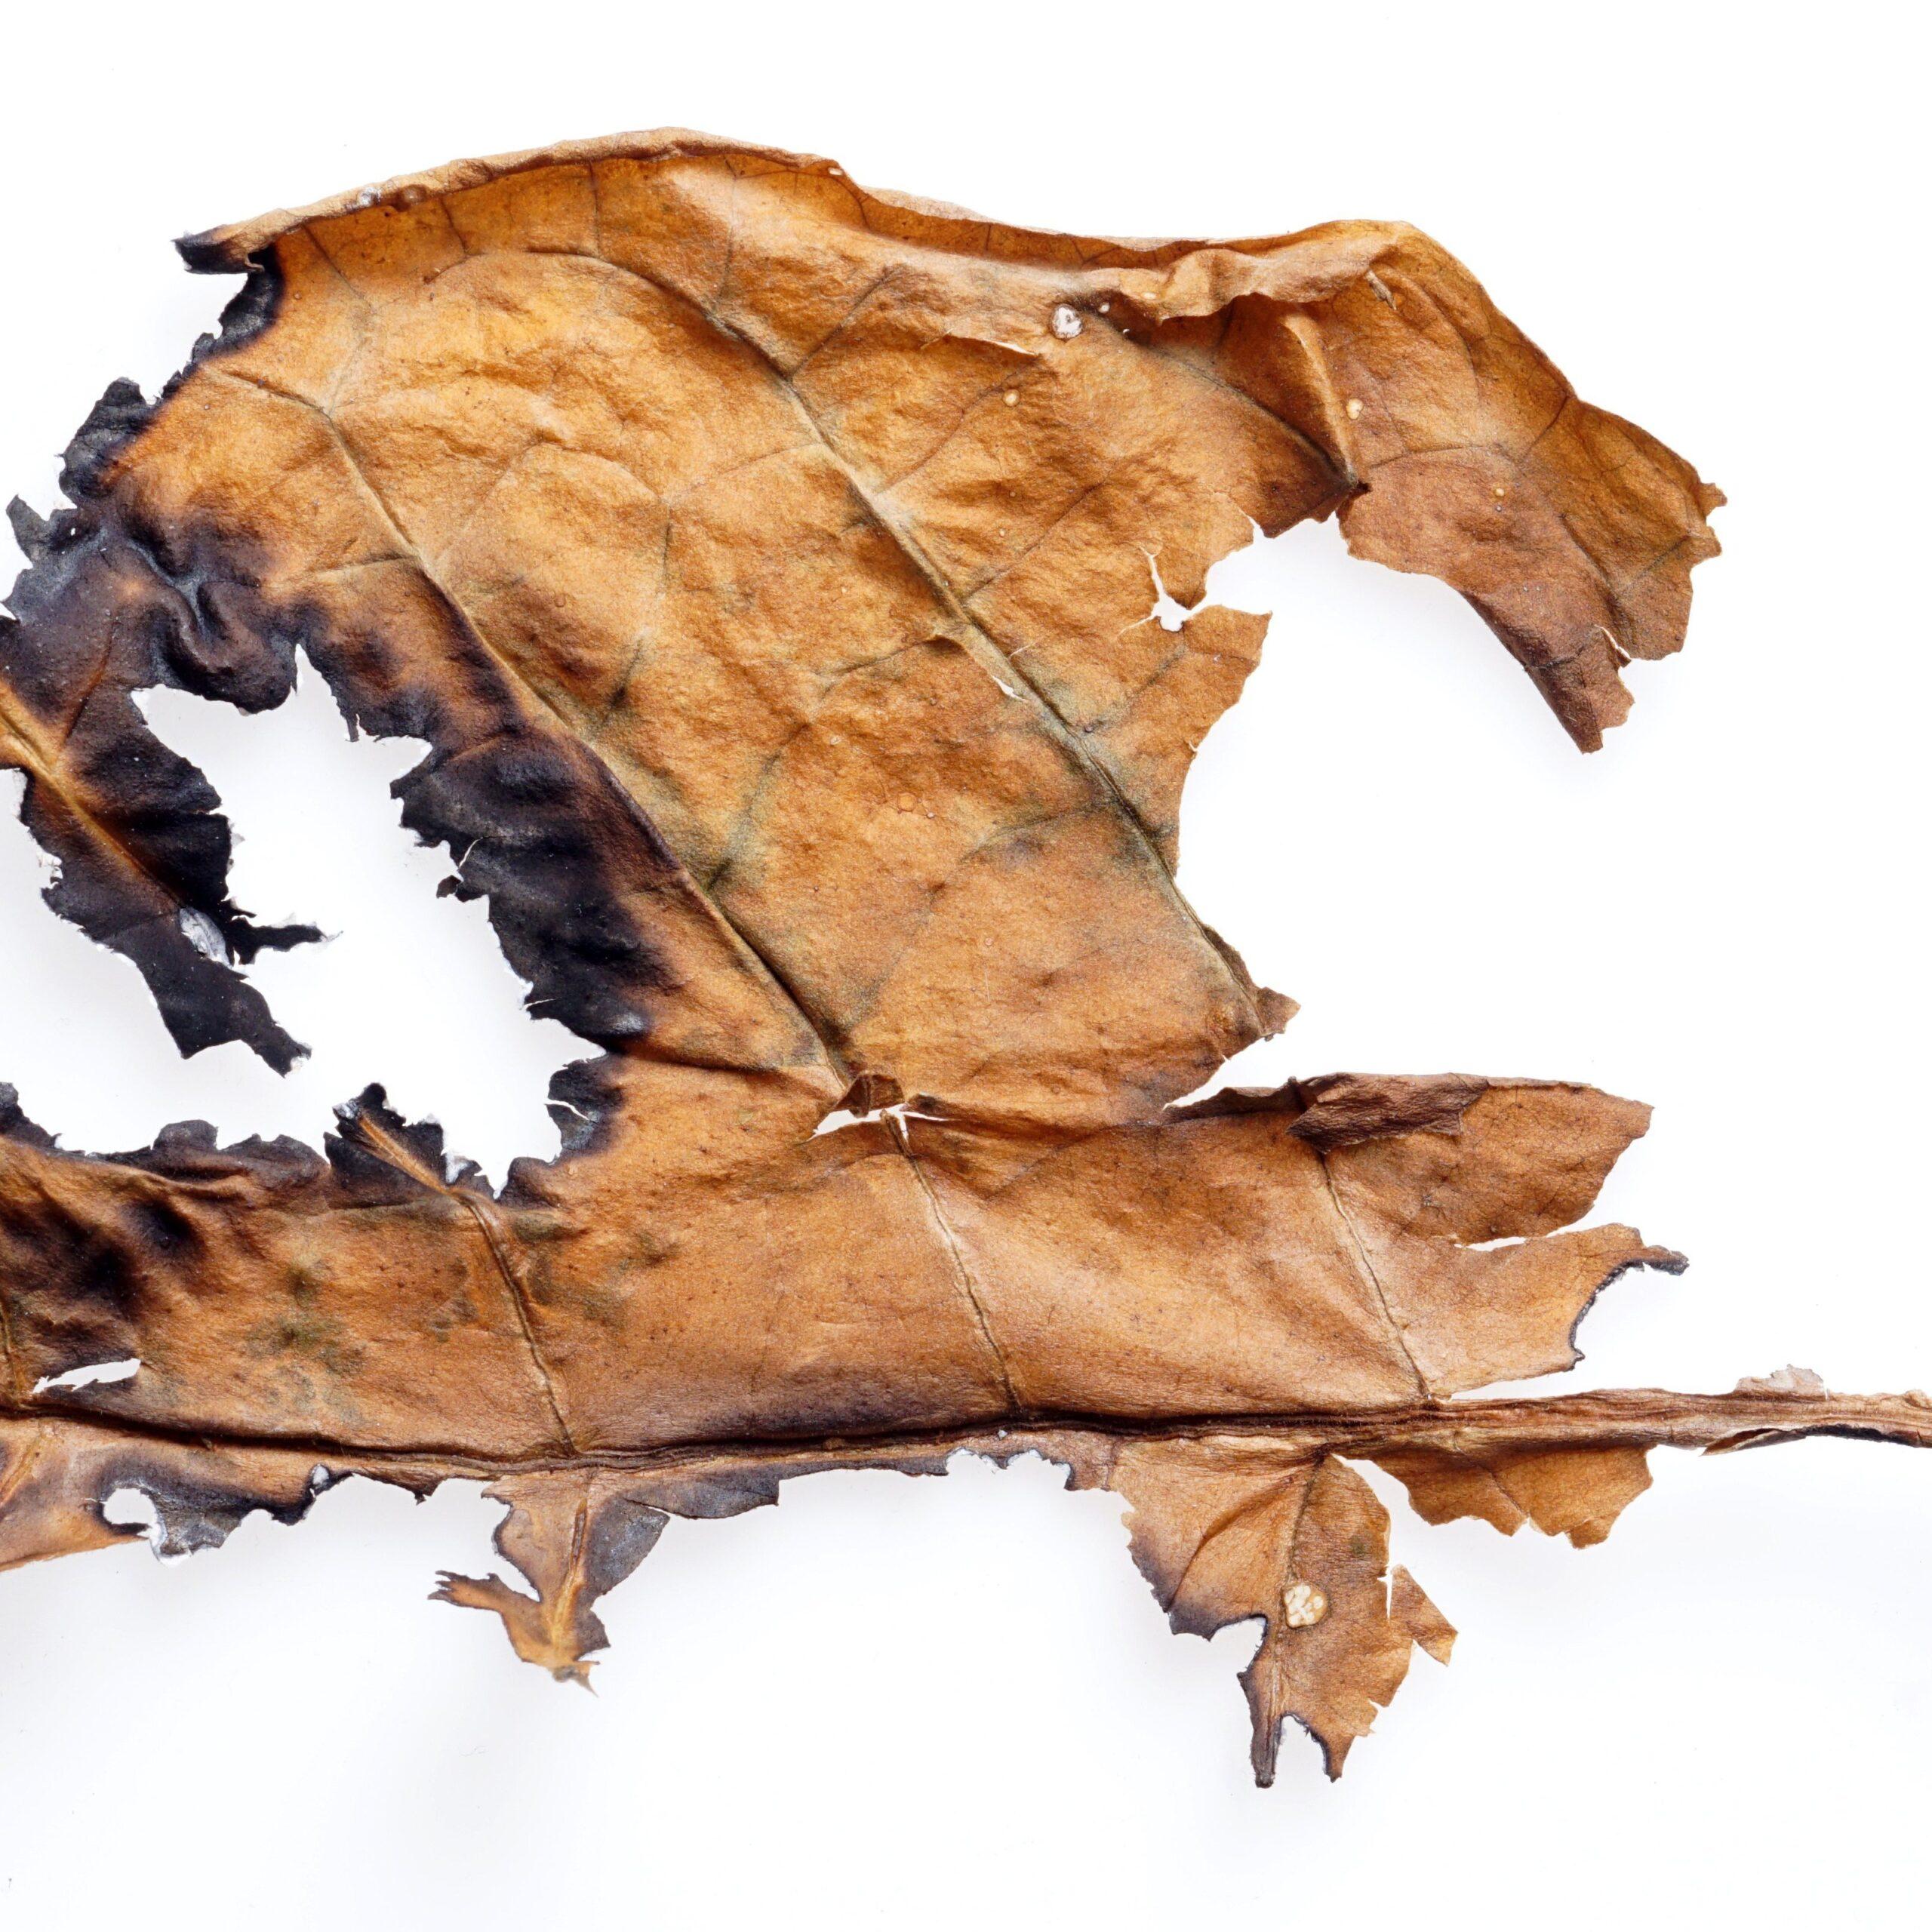 FA 7 Leaves-Vape Distribution Australia